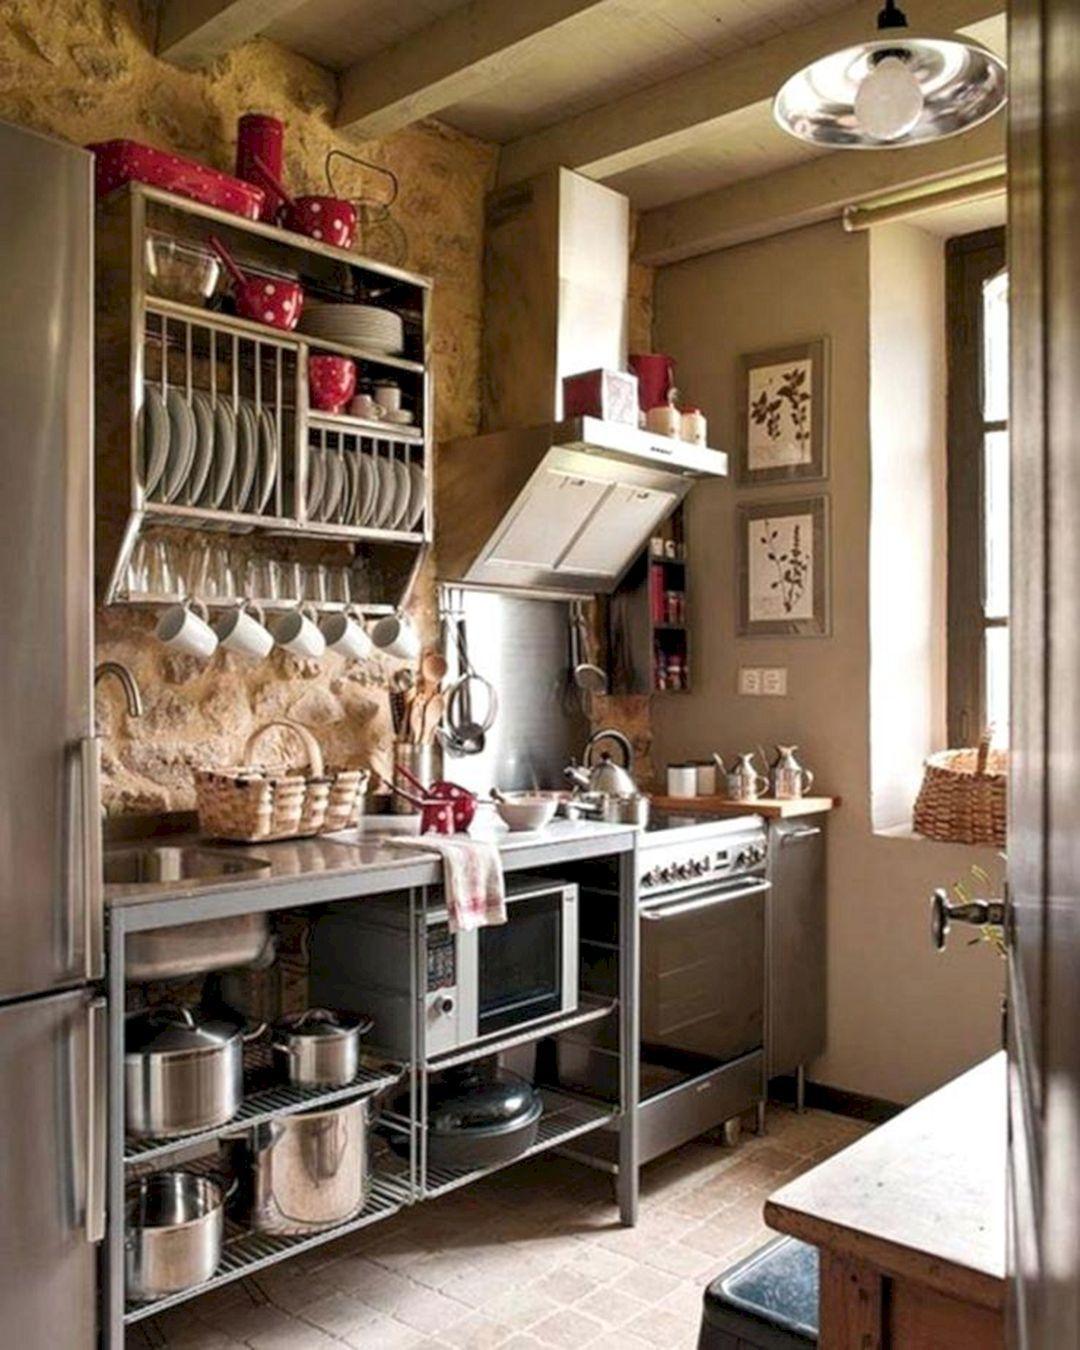 21 japanese kitchen design that makes you amazed freshouz com small rustic kitchens country on kitchen organization japanese id=12509